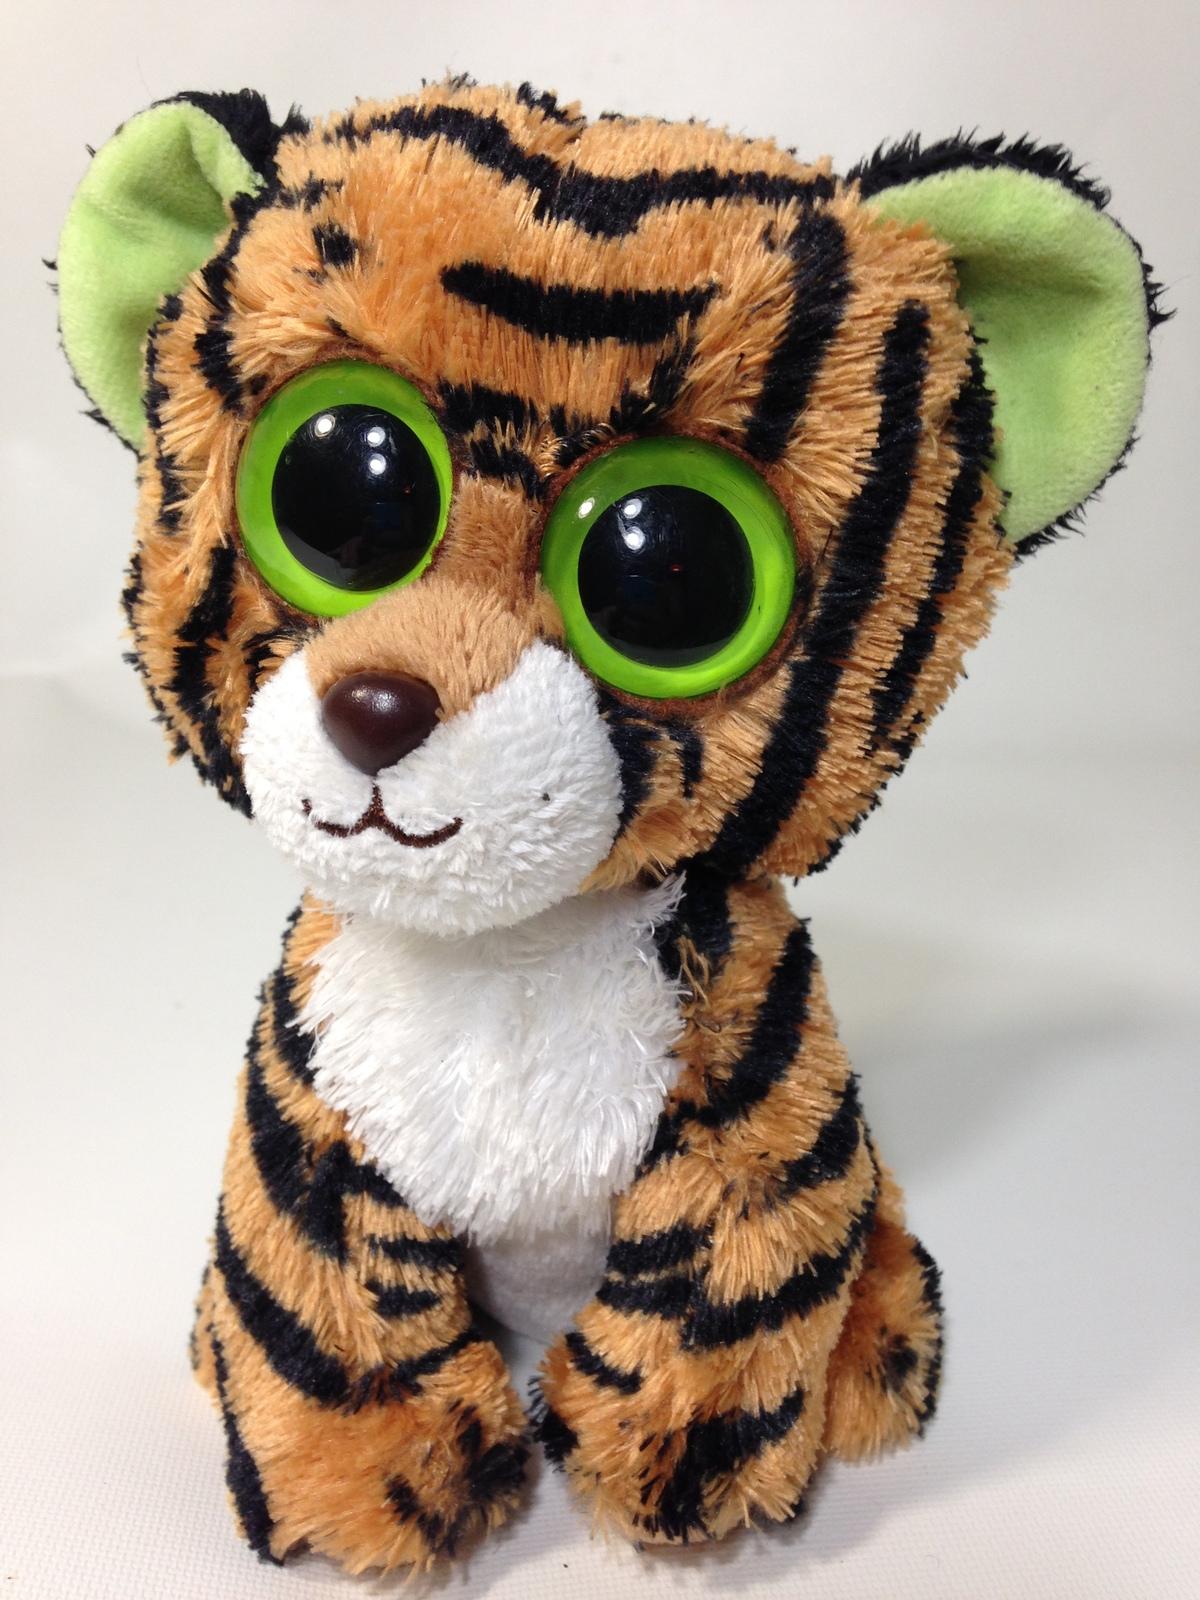 d7847c5fc4f Ty beanie boo stripes tiger cat 6 plush stuffed solid green eyes toy 1